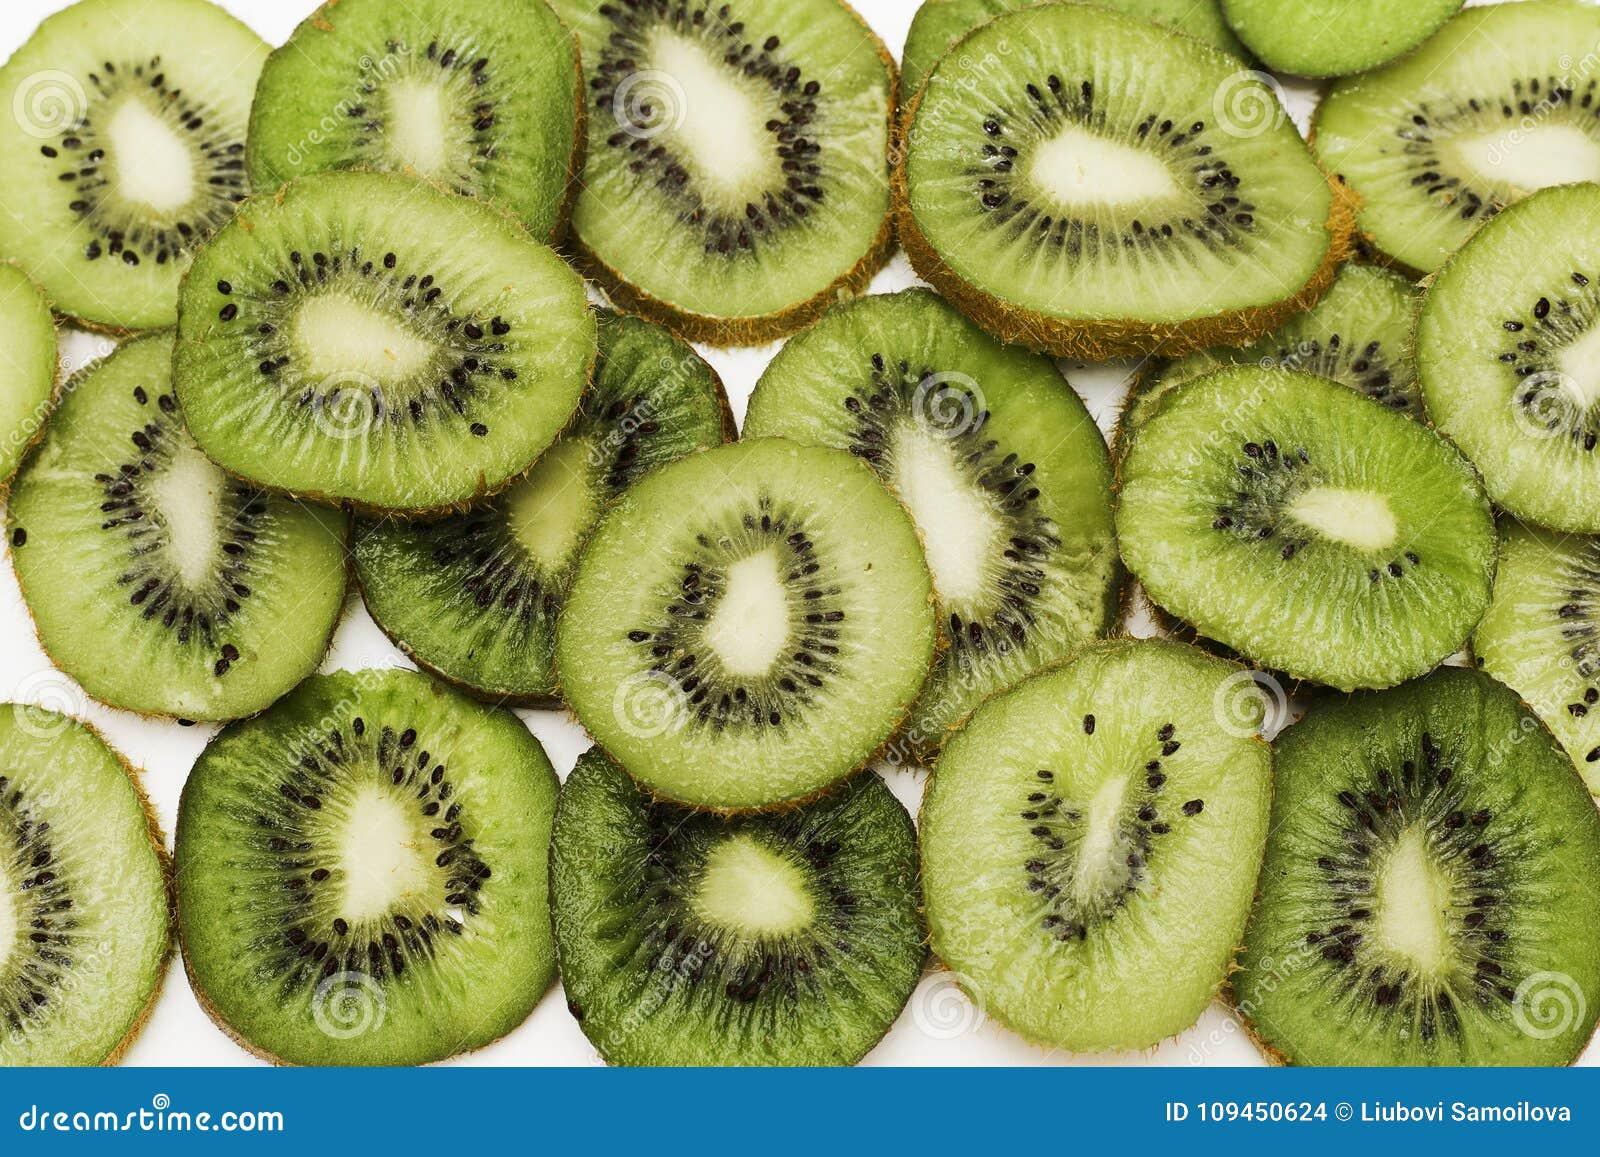 The cut kiwi fruit. Close-up background texture